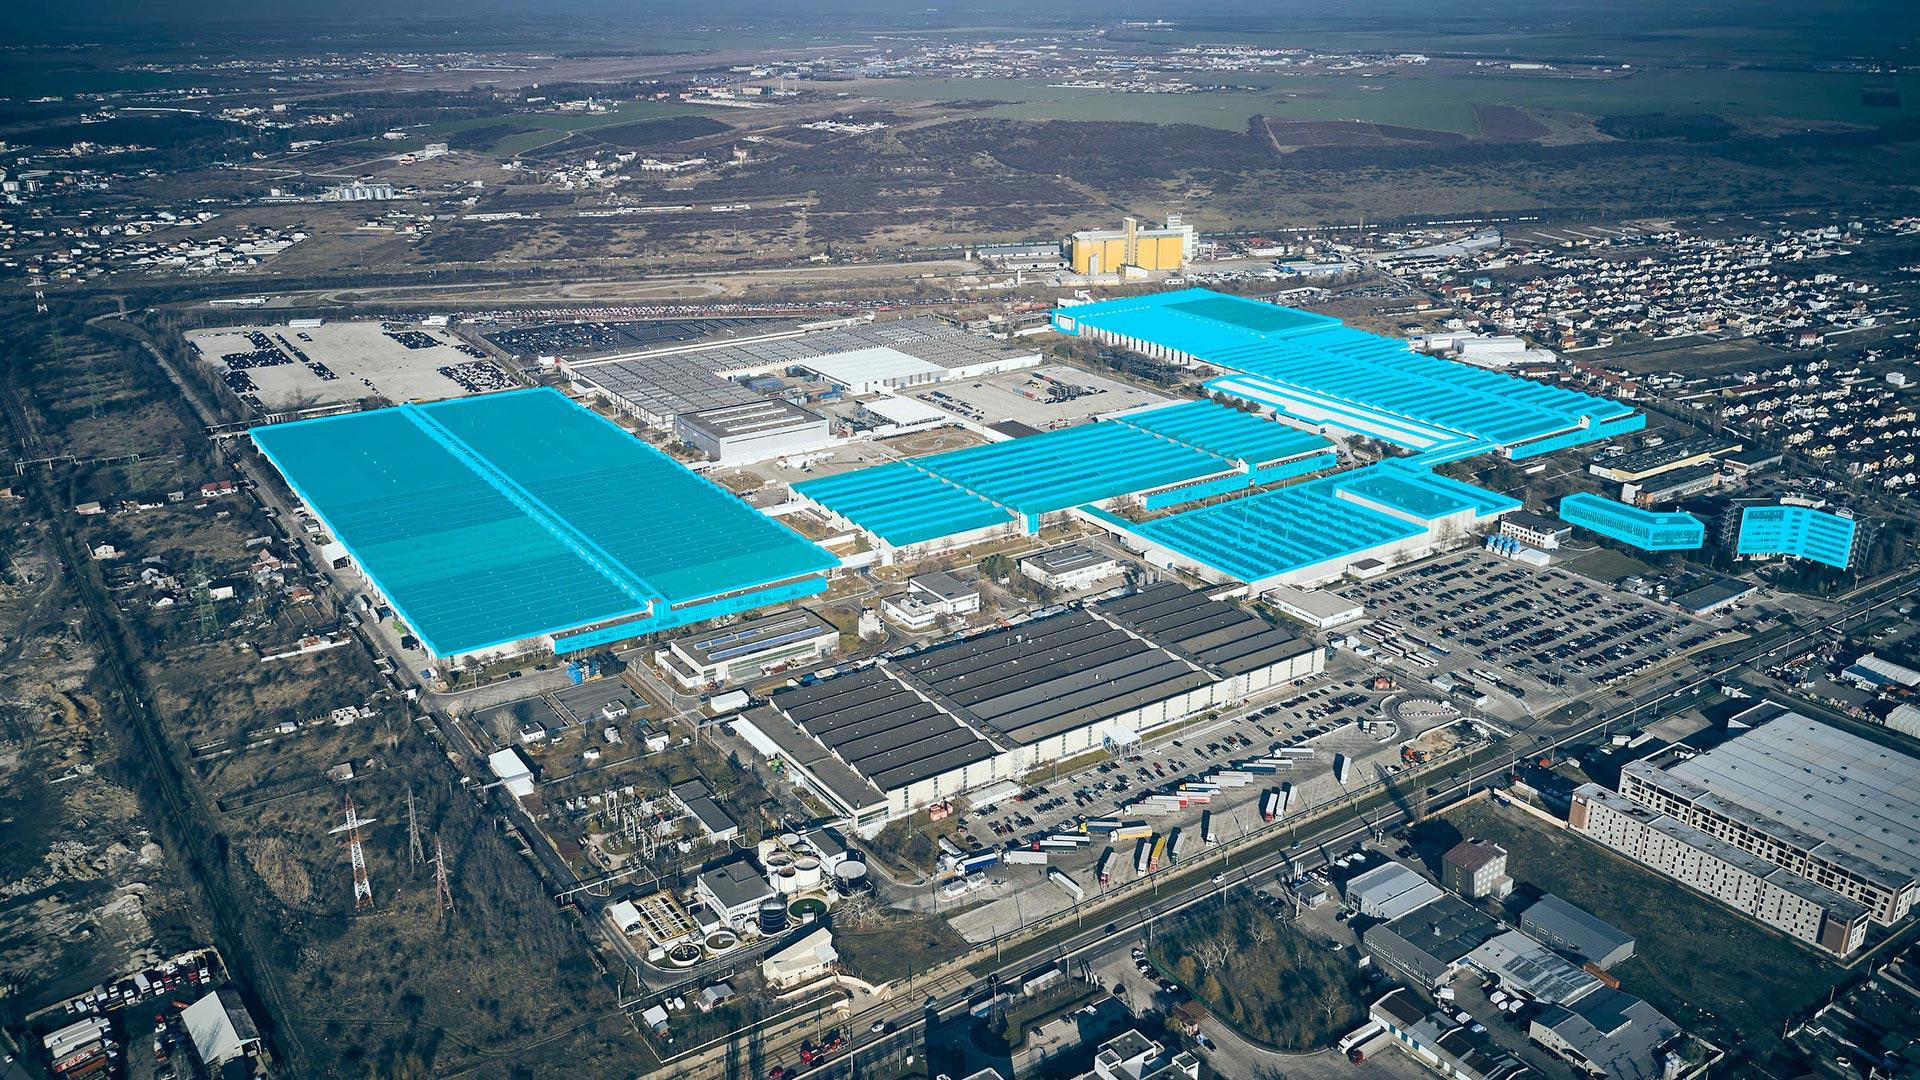 Ford: Νέες επενδύσεις στο εργοστάσιο της στη Ρουμανία